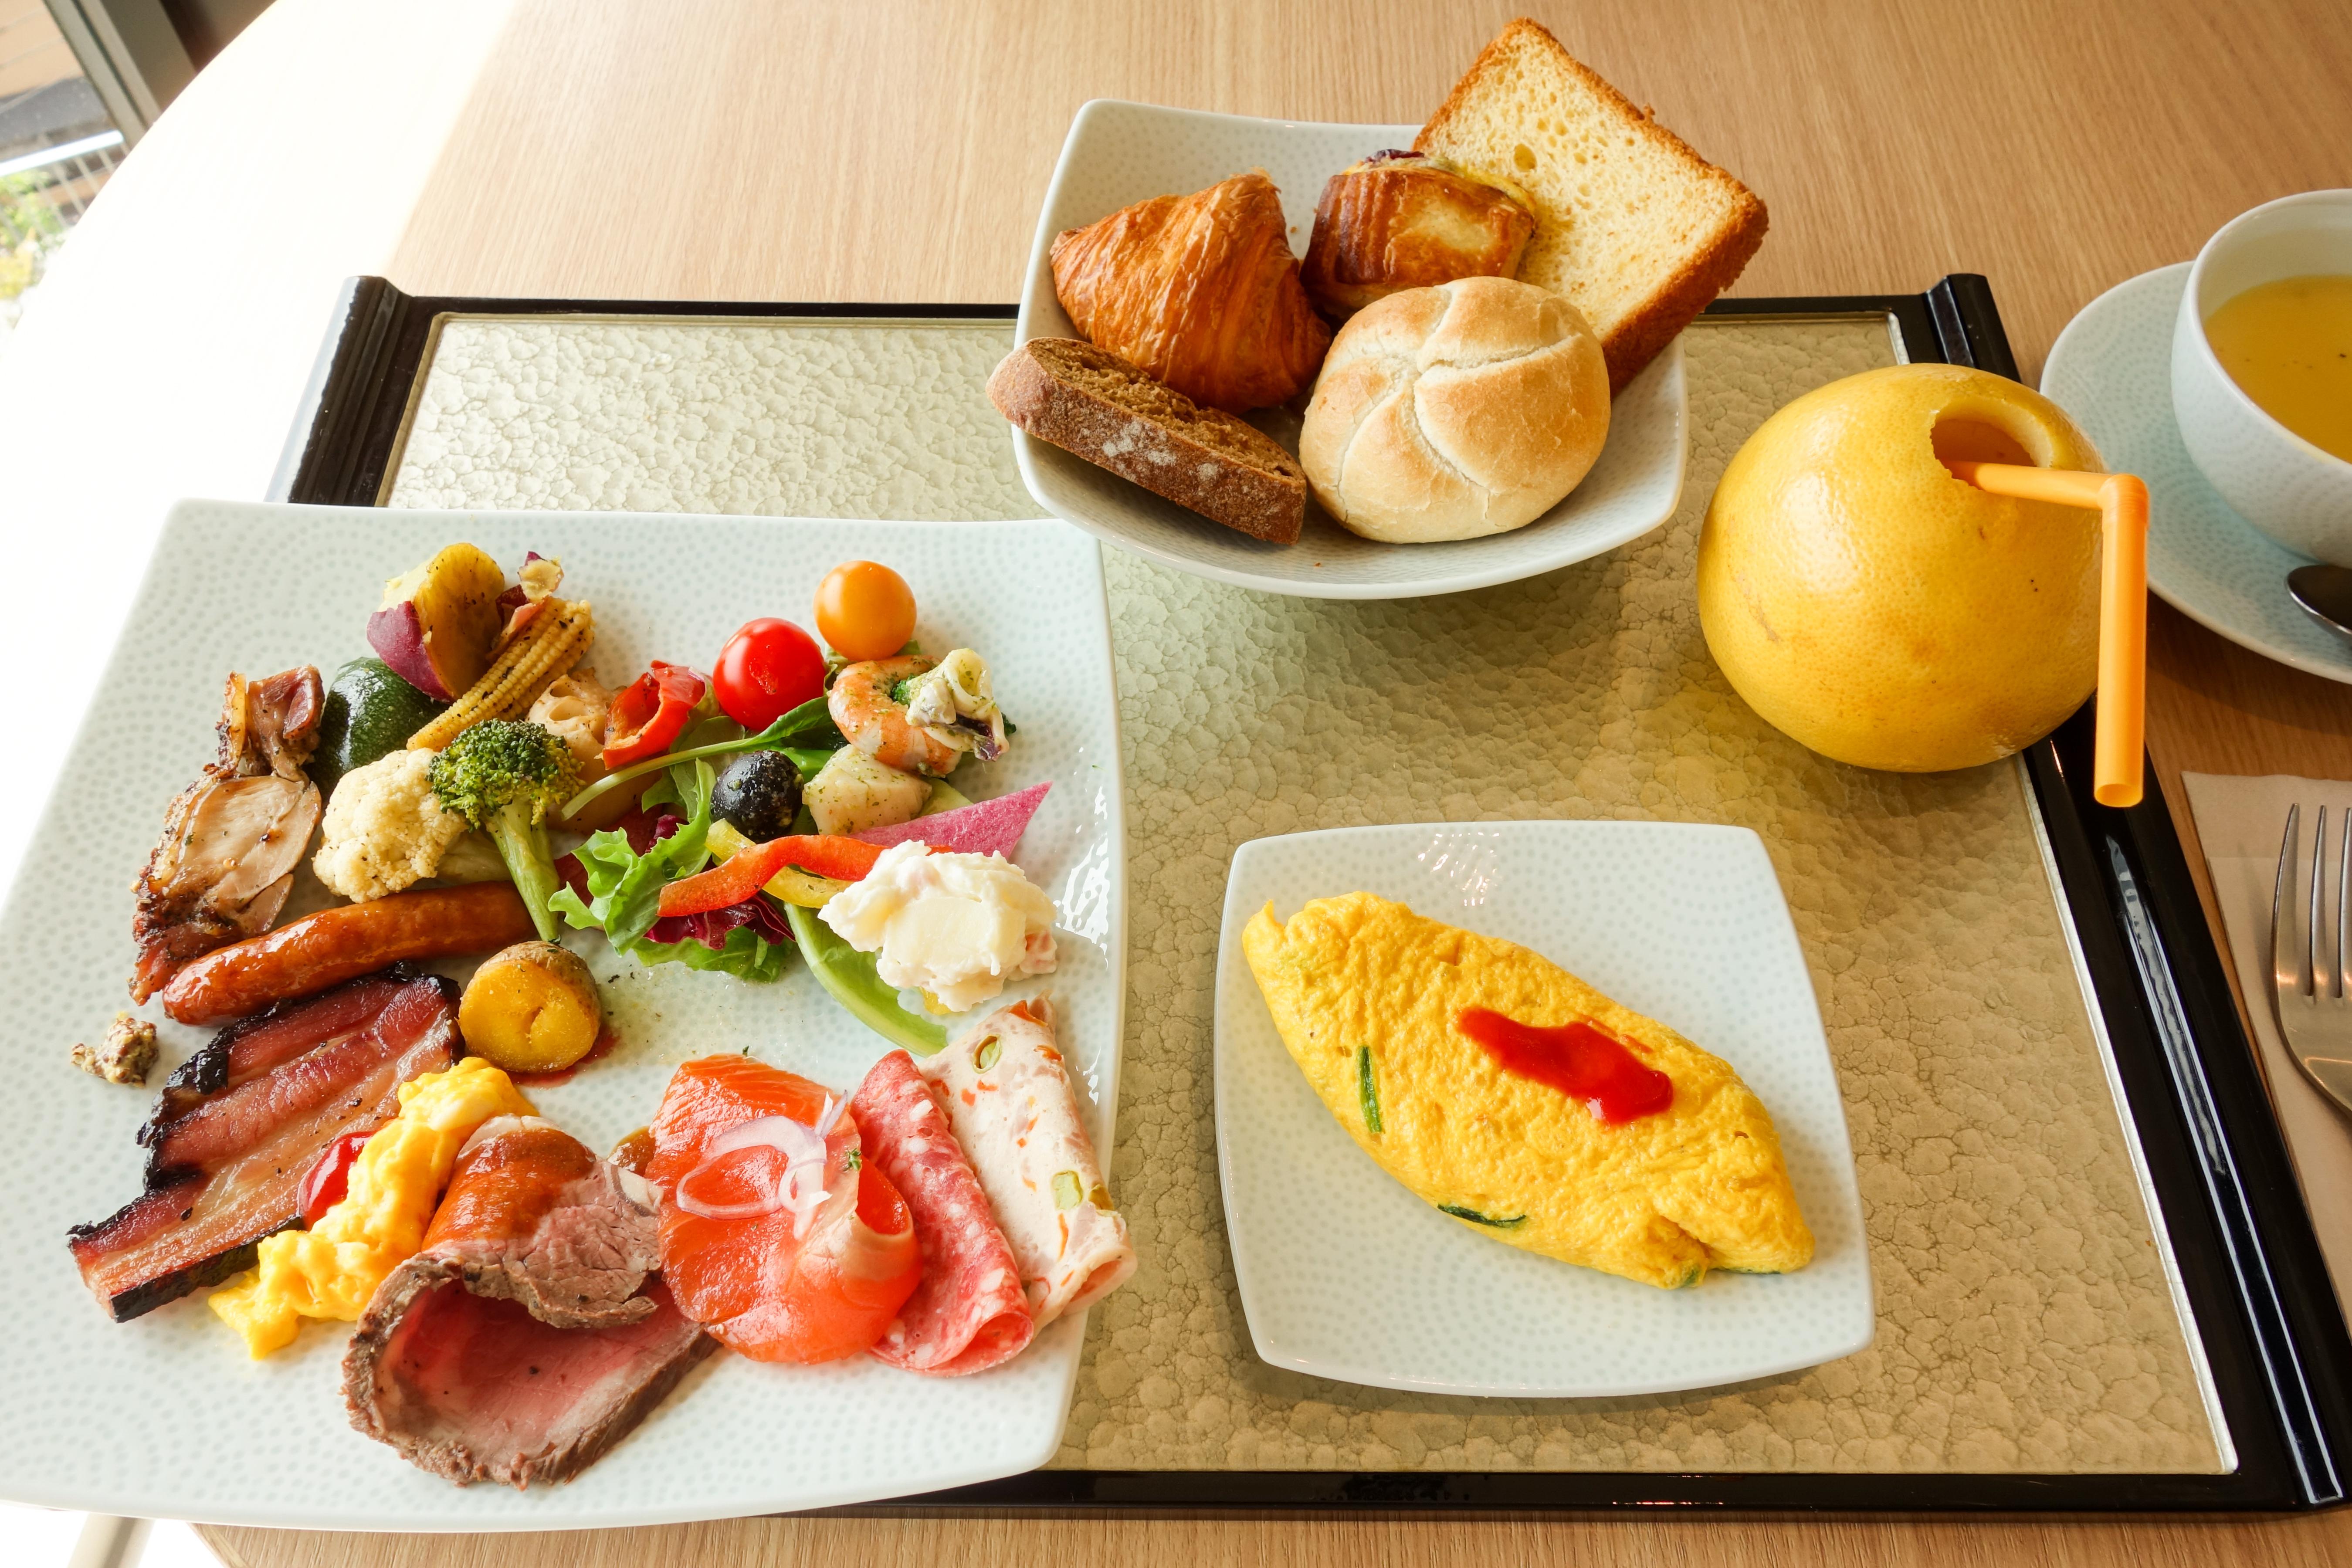 File Richmond Hotel Premier Asakusa International Breakfast Buffet